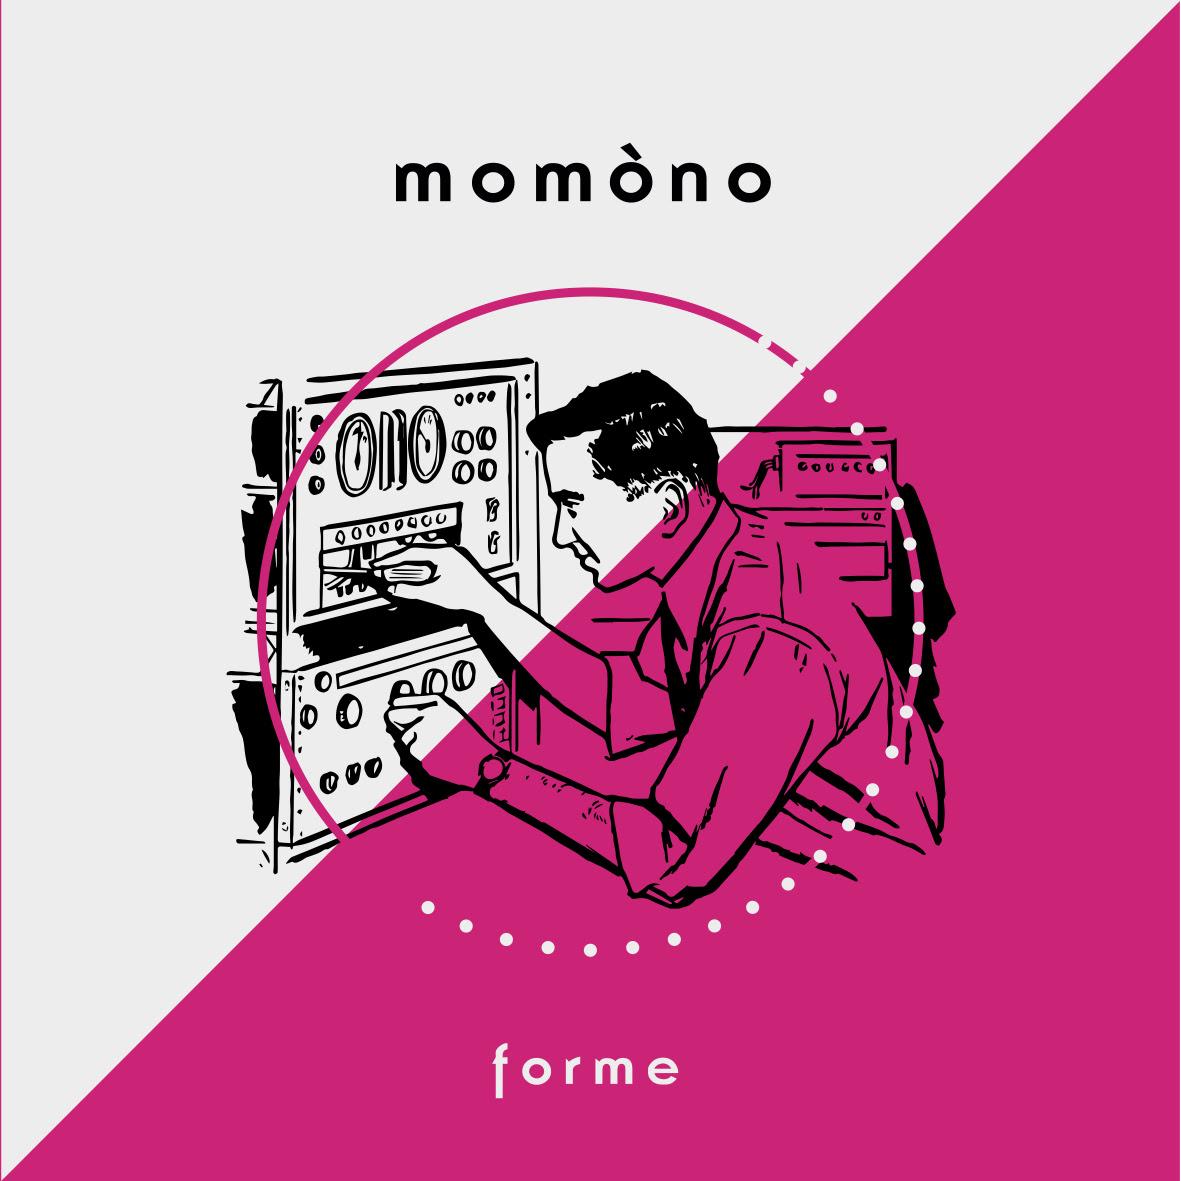 Forme di Momòno, singolo di esordio di Edoardo De Santis e Francesco Di Marco